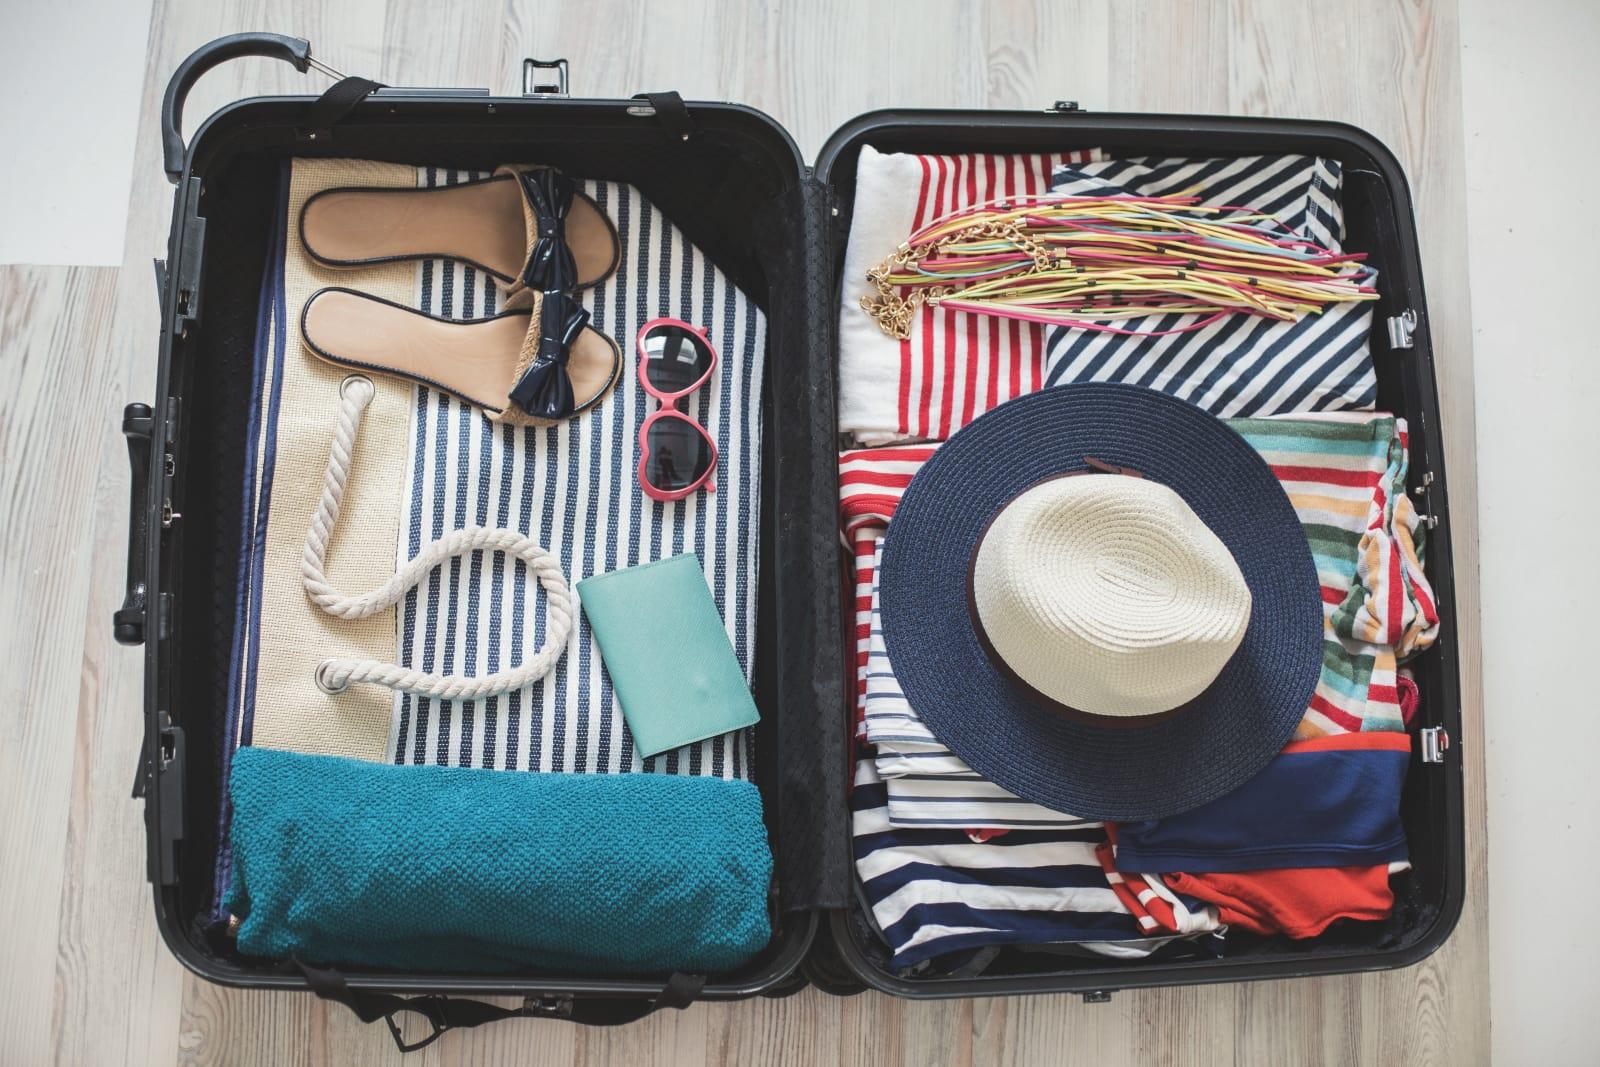 Pack like a pro